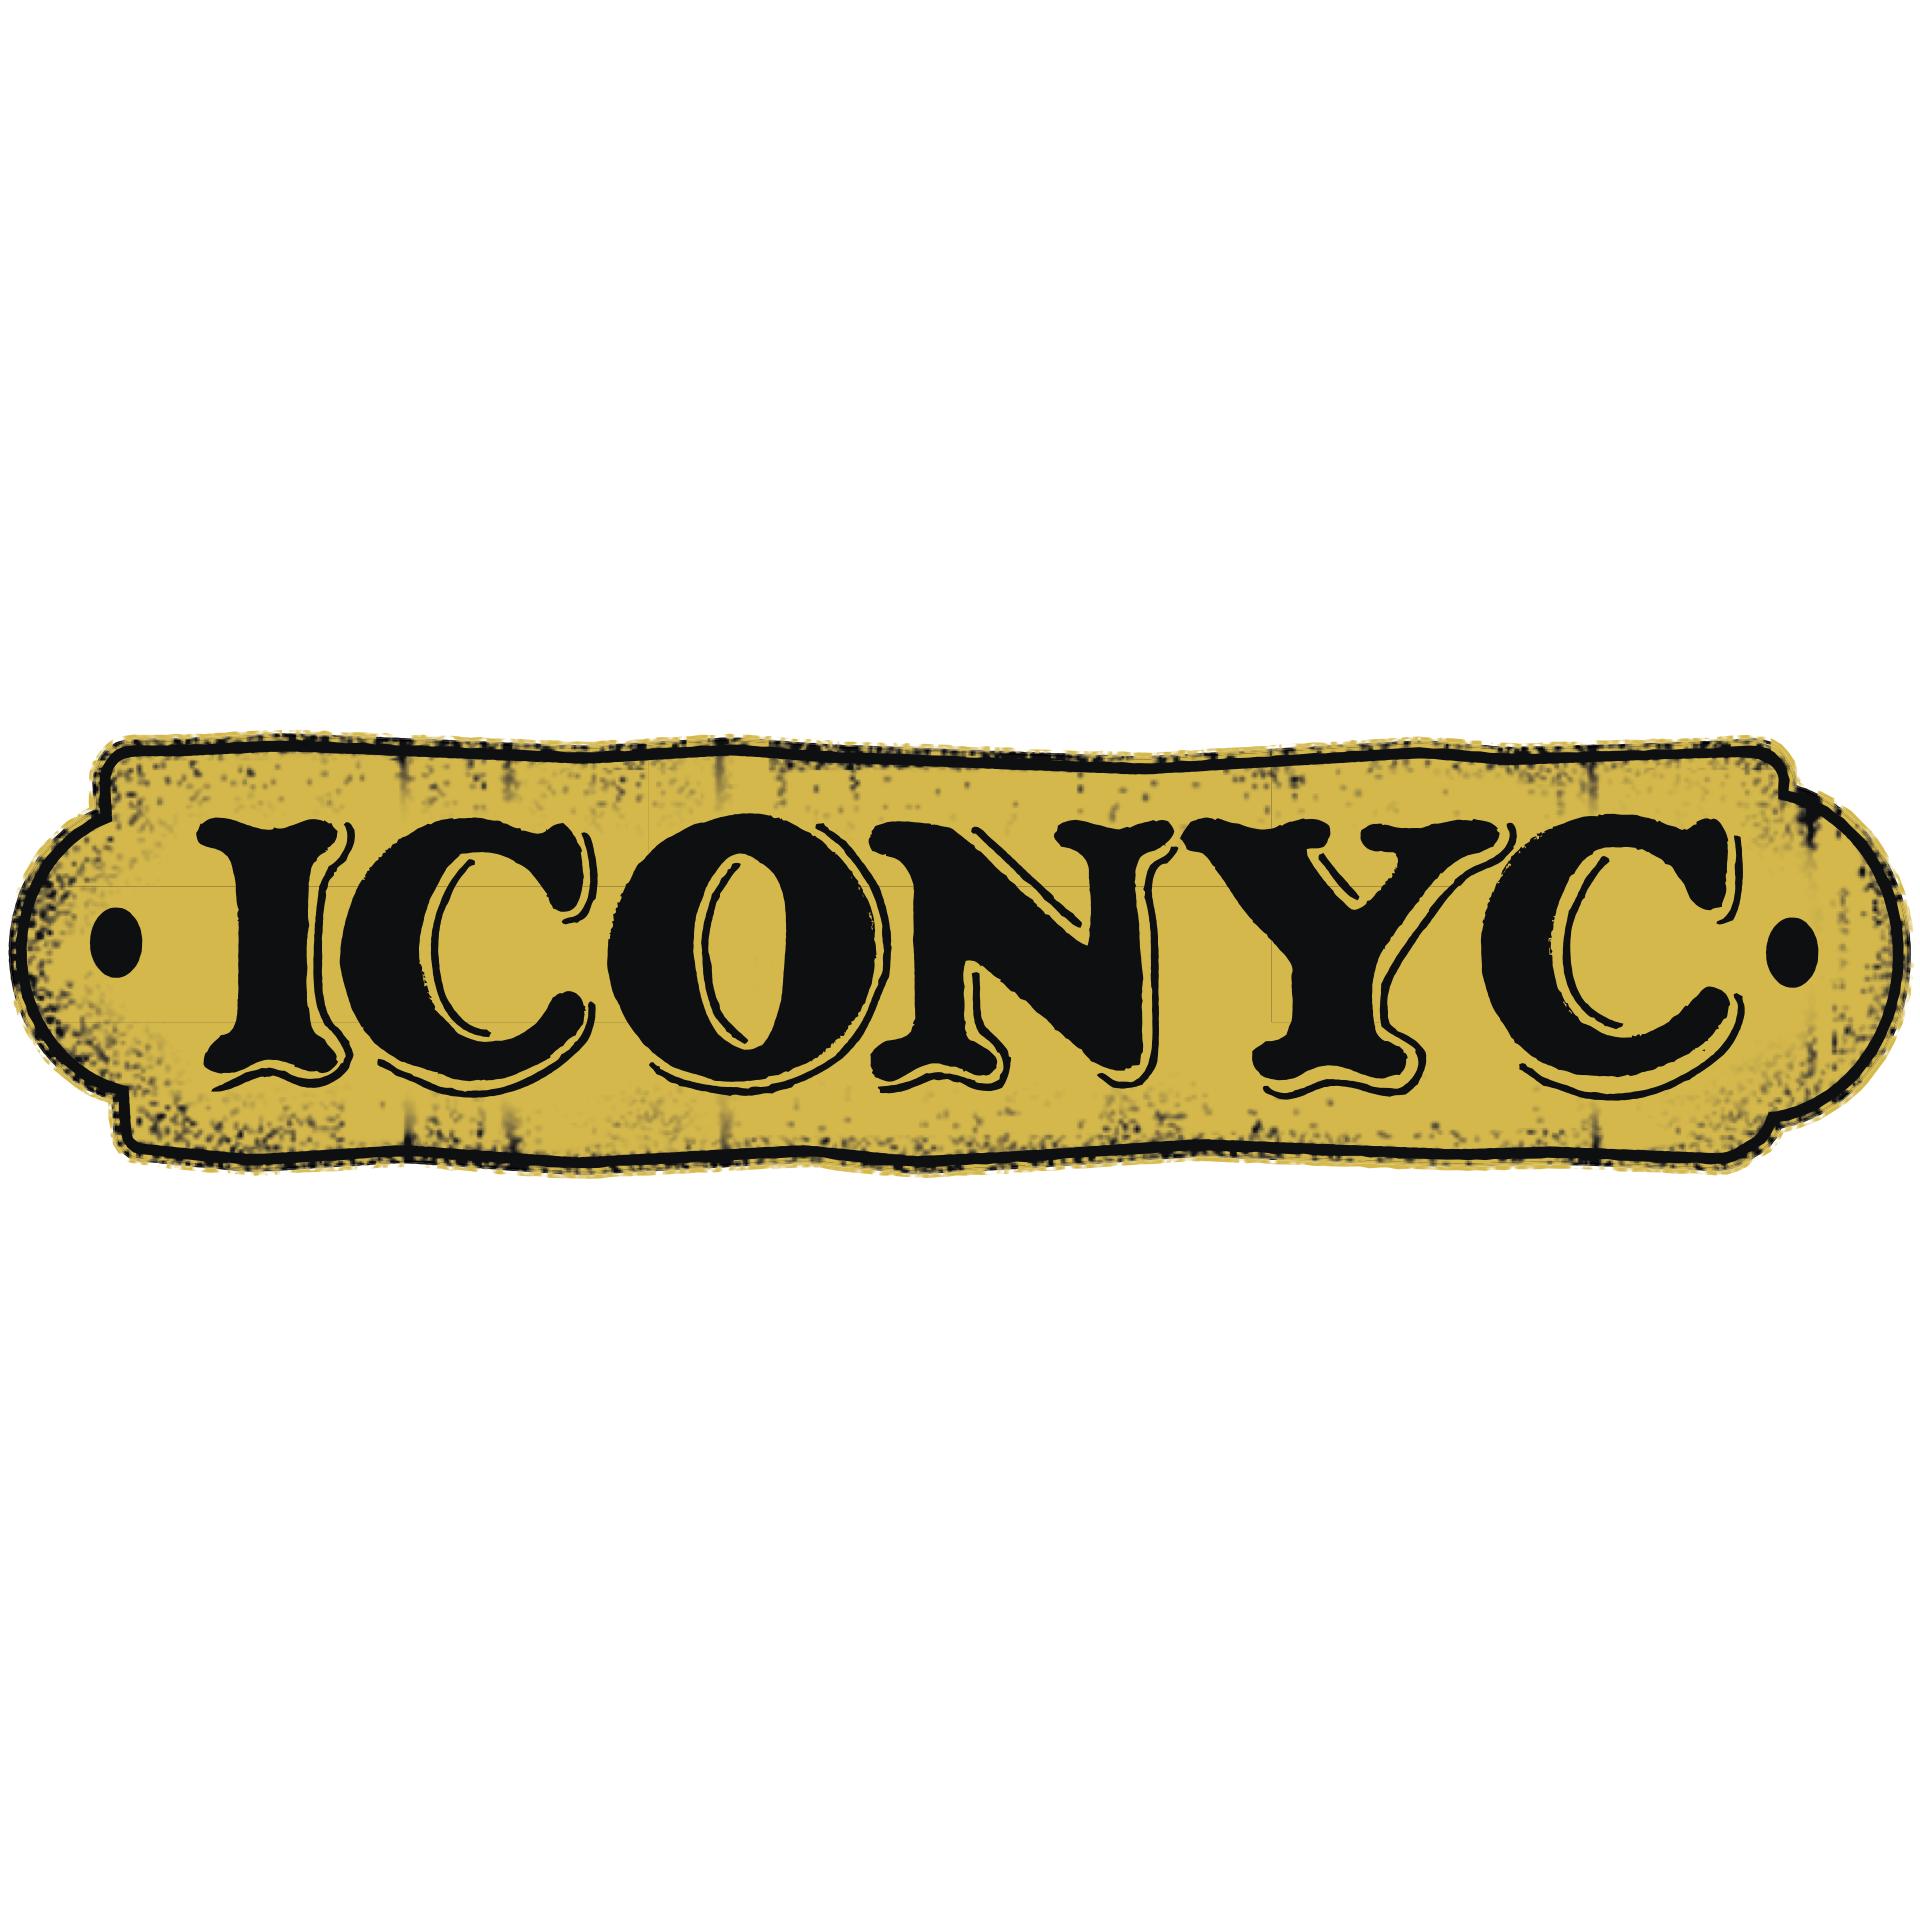 ICONYC John Blaze beer Label Full Size